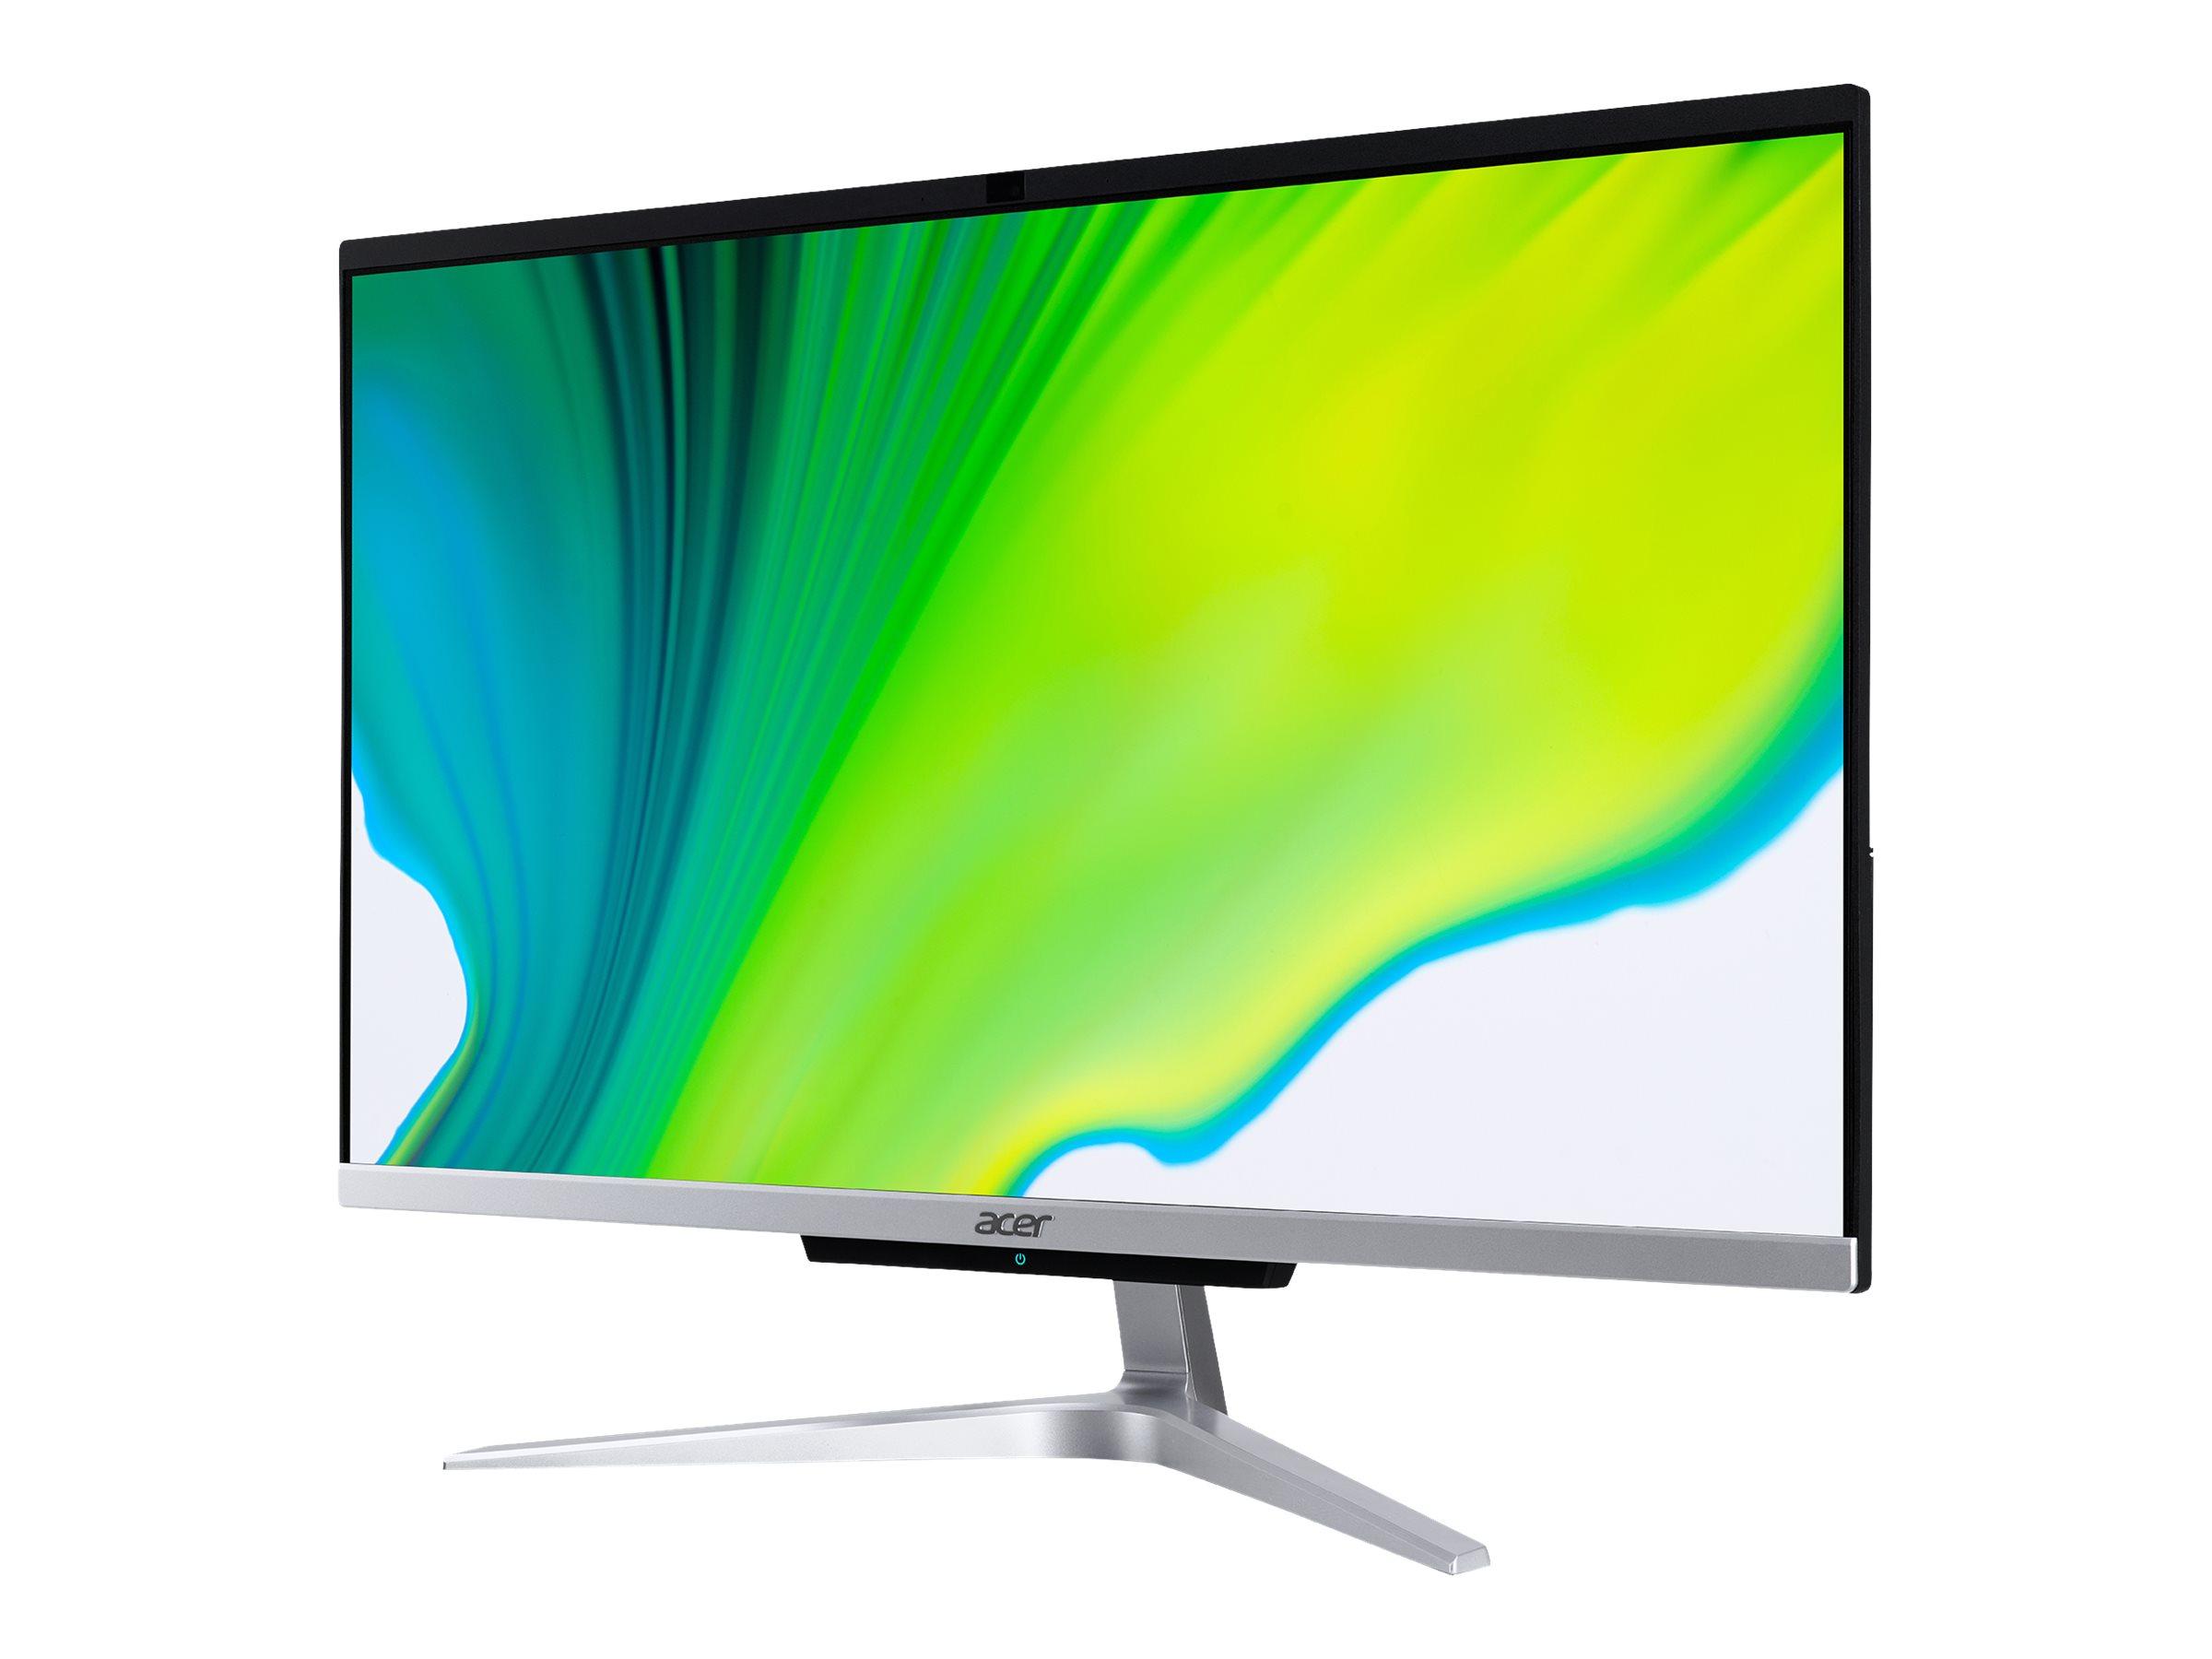 Acer Aspire C 24 C24-420 - All-in-One (Komplettl?sung) - Ryzen 3 3250U / 2.6 GHz - RAM 8 GB - SSD 512 GB - Radeon Graphi